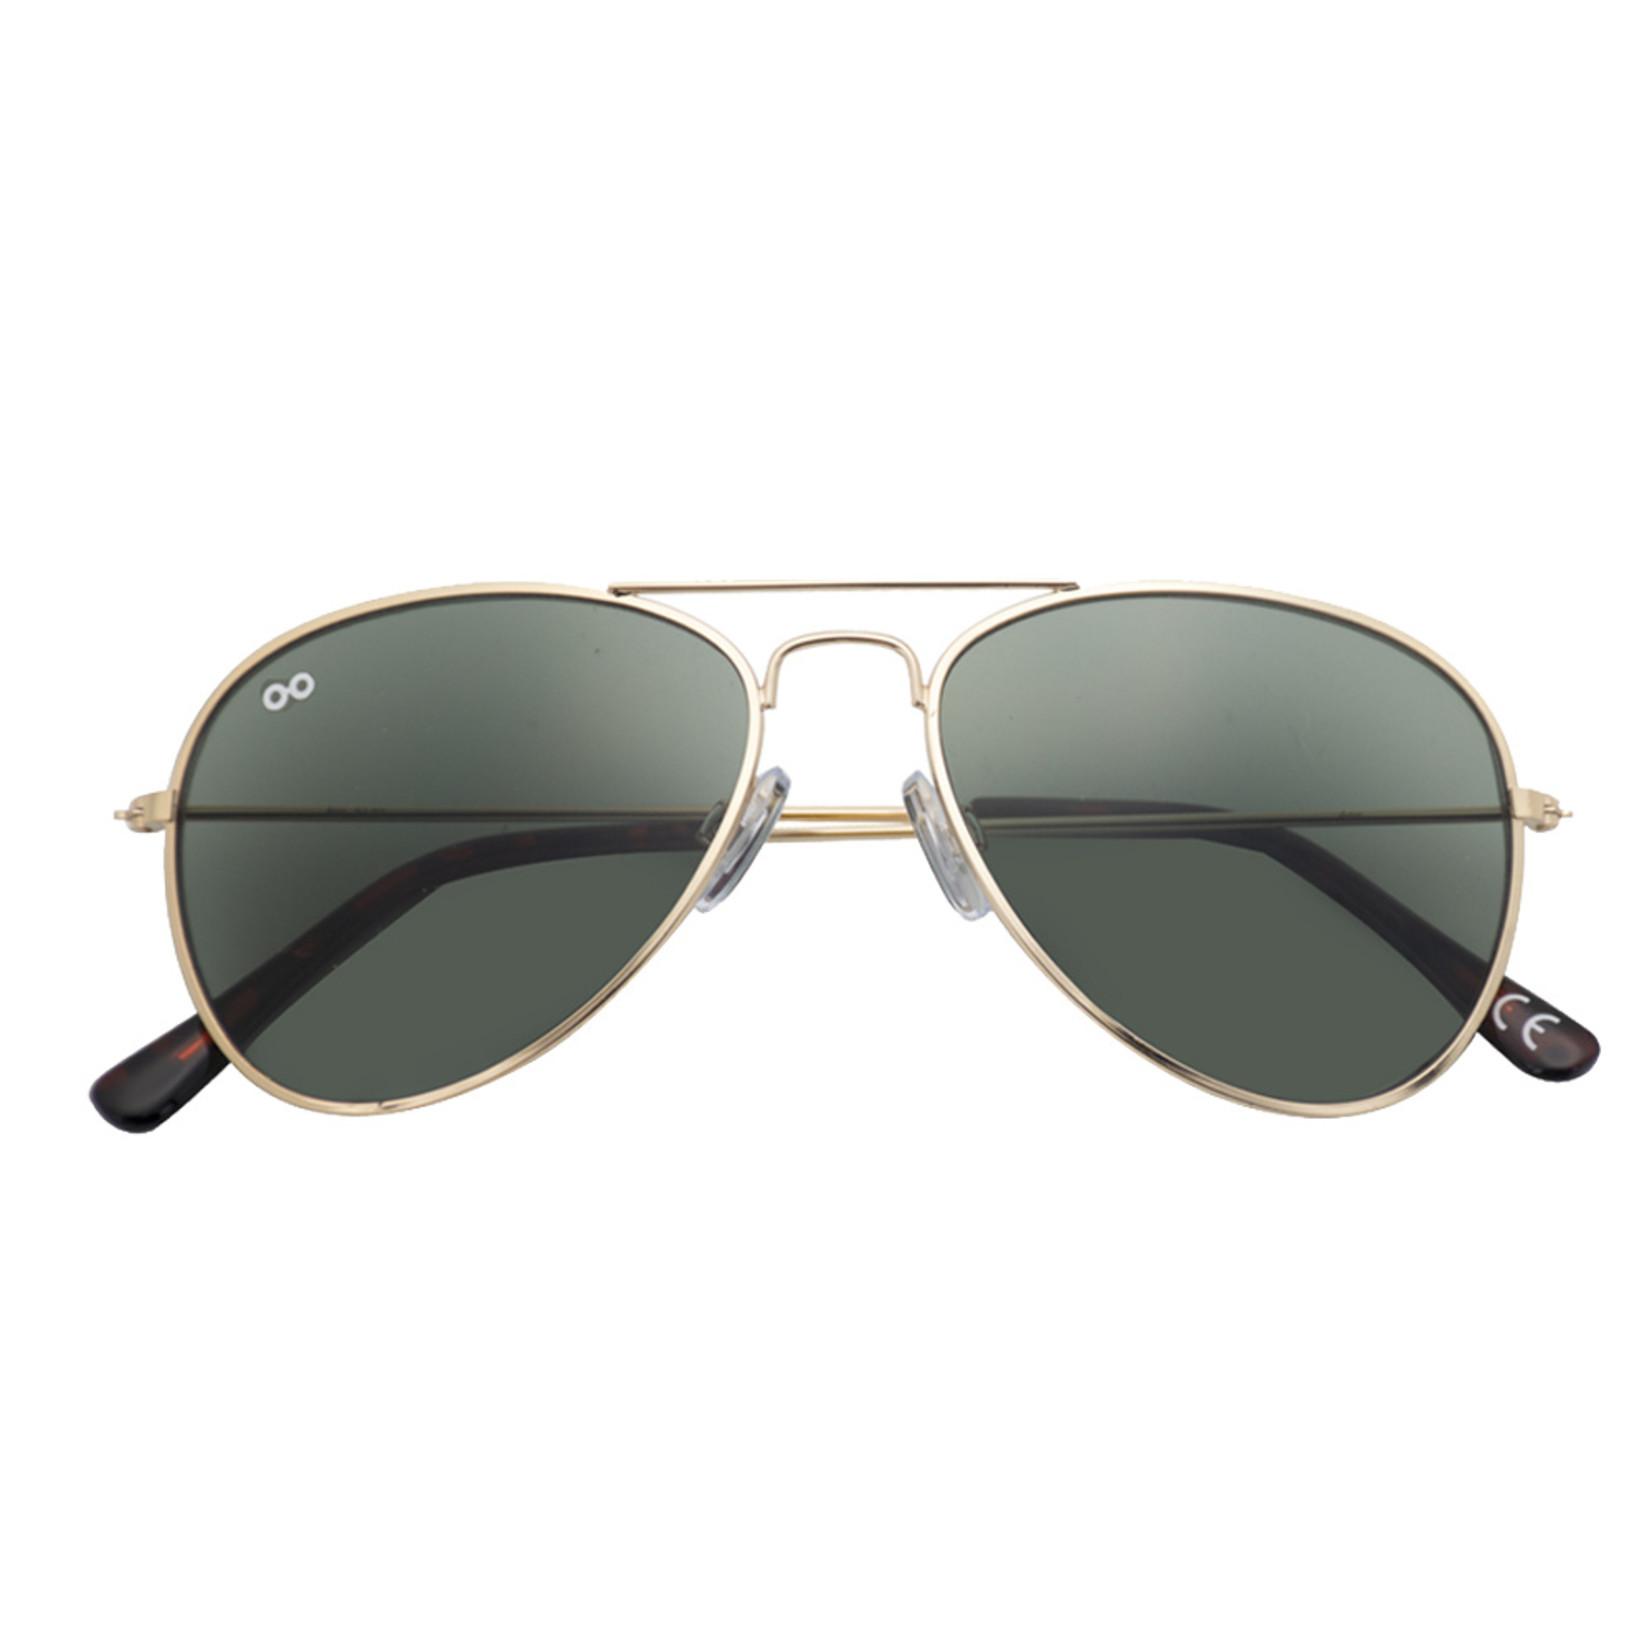 Croon Ann Satin Gold  zonnebril pilotenbril